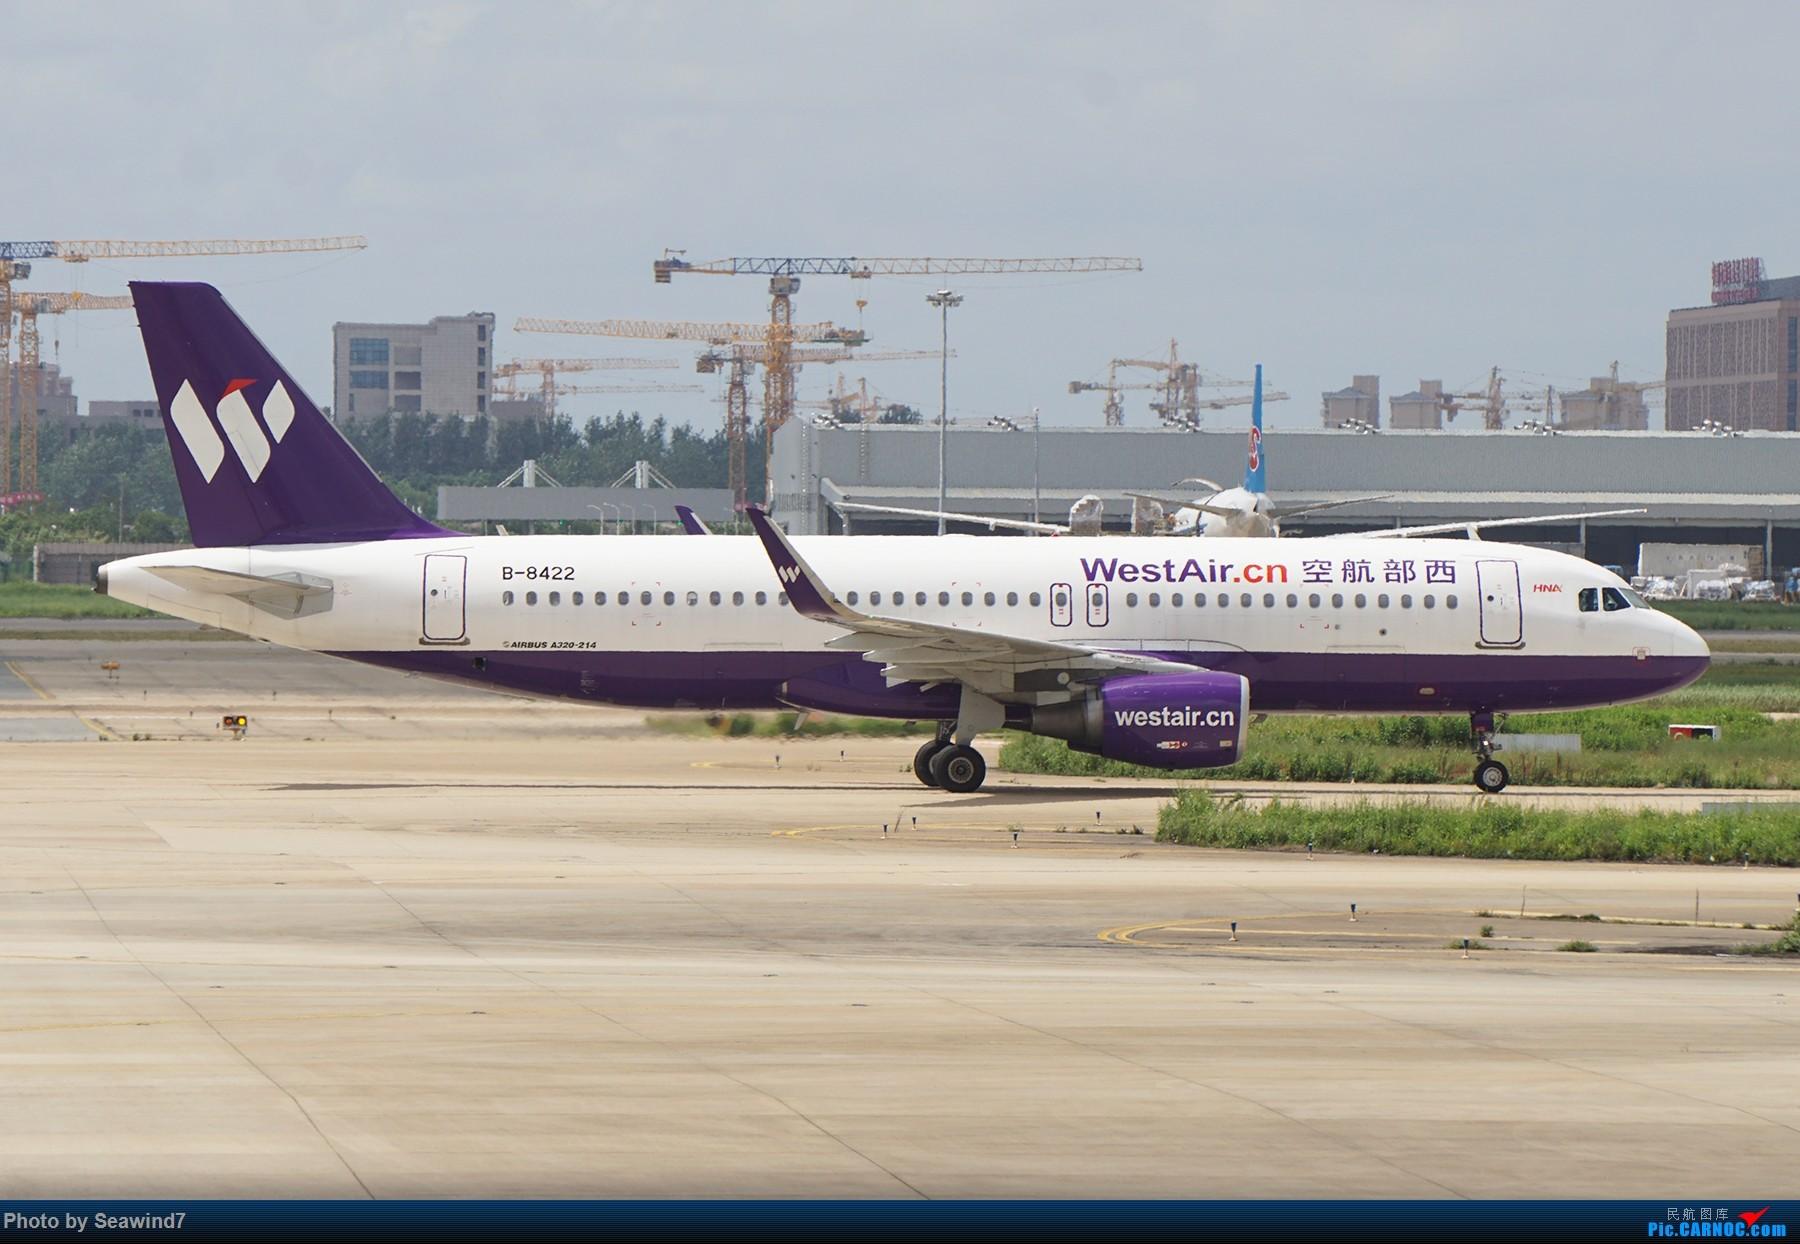 Re:[原创]浦东拍机记 AIRBUS A320-200 B-8422 中国上海浦东国际机场